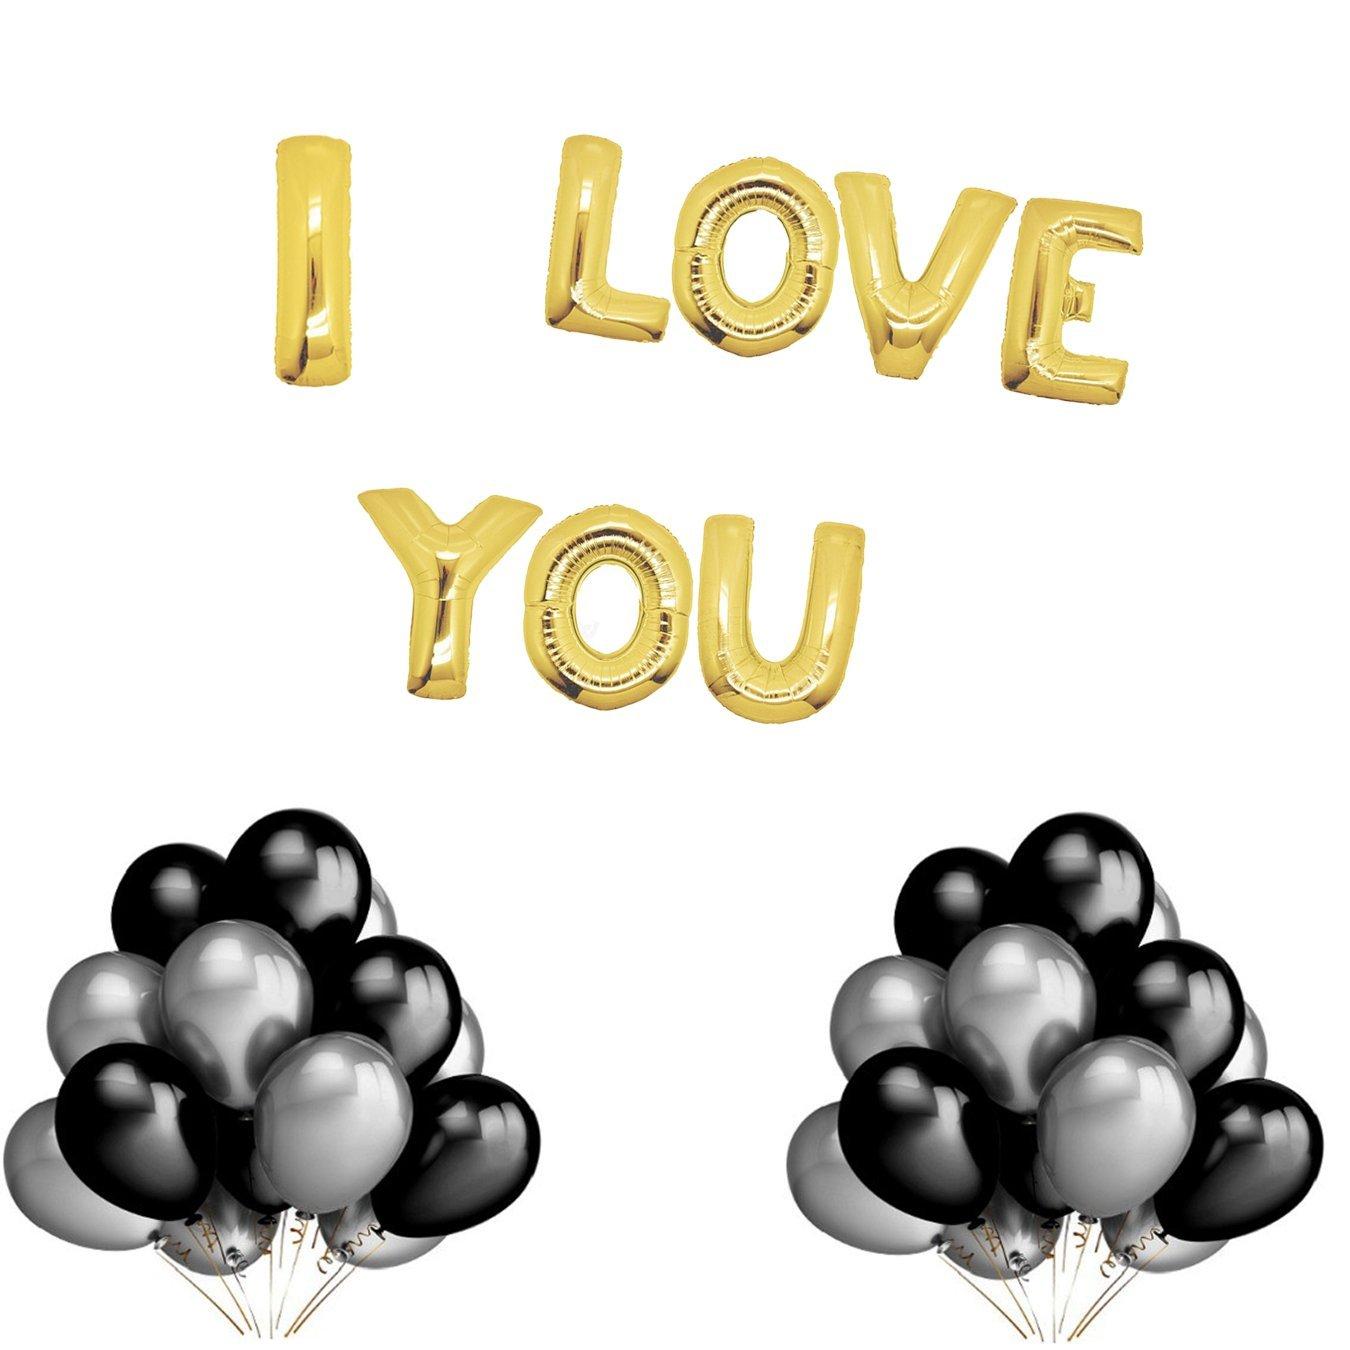 I LOVE U Helium Balloon Gold Decoration Set, Black Balloons for Wall Decorations,Party Decorations, Lover's Birthday and Big day